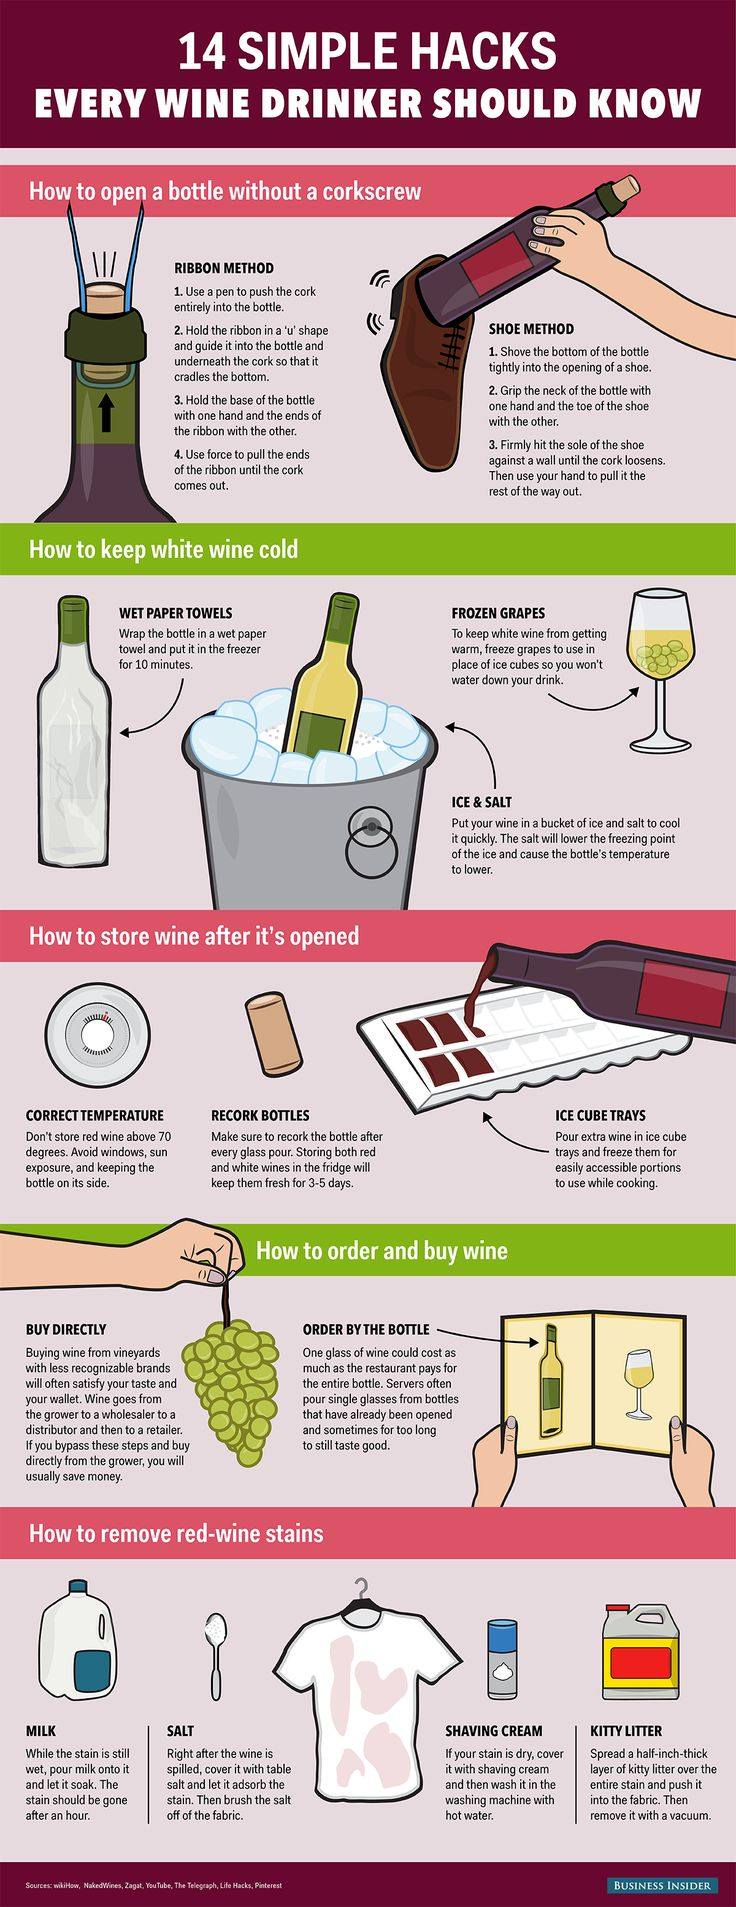 Wine hacks everyone should know